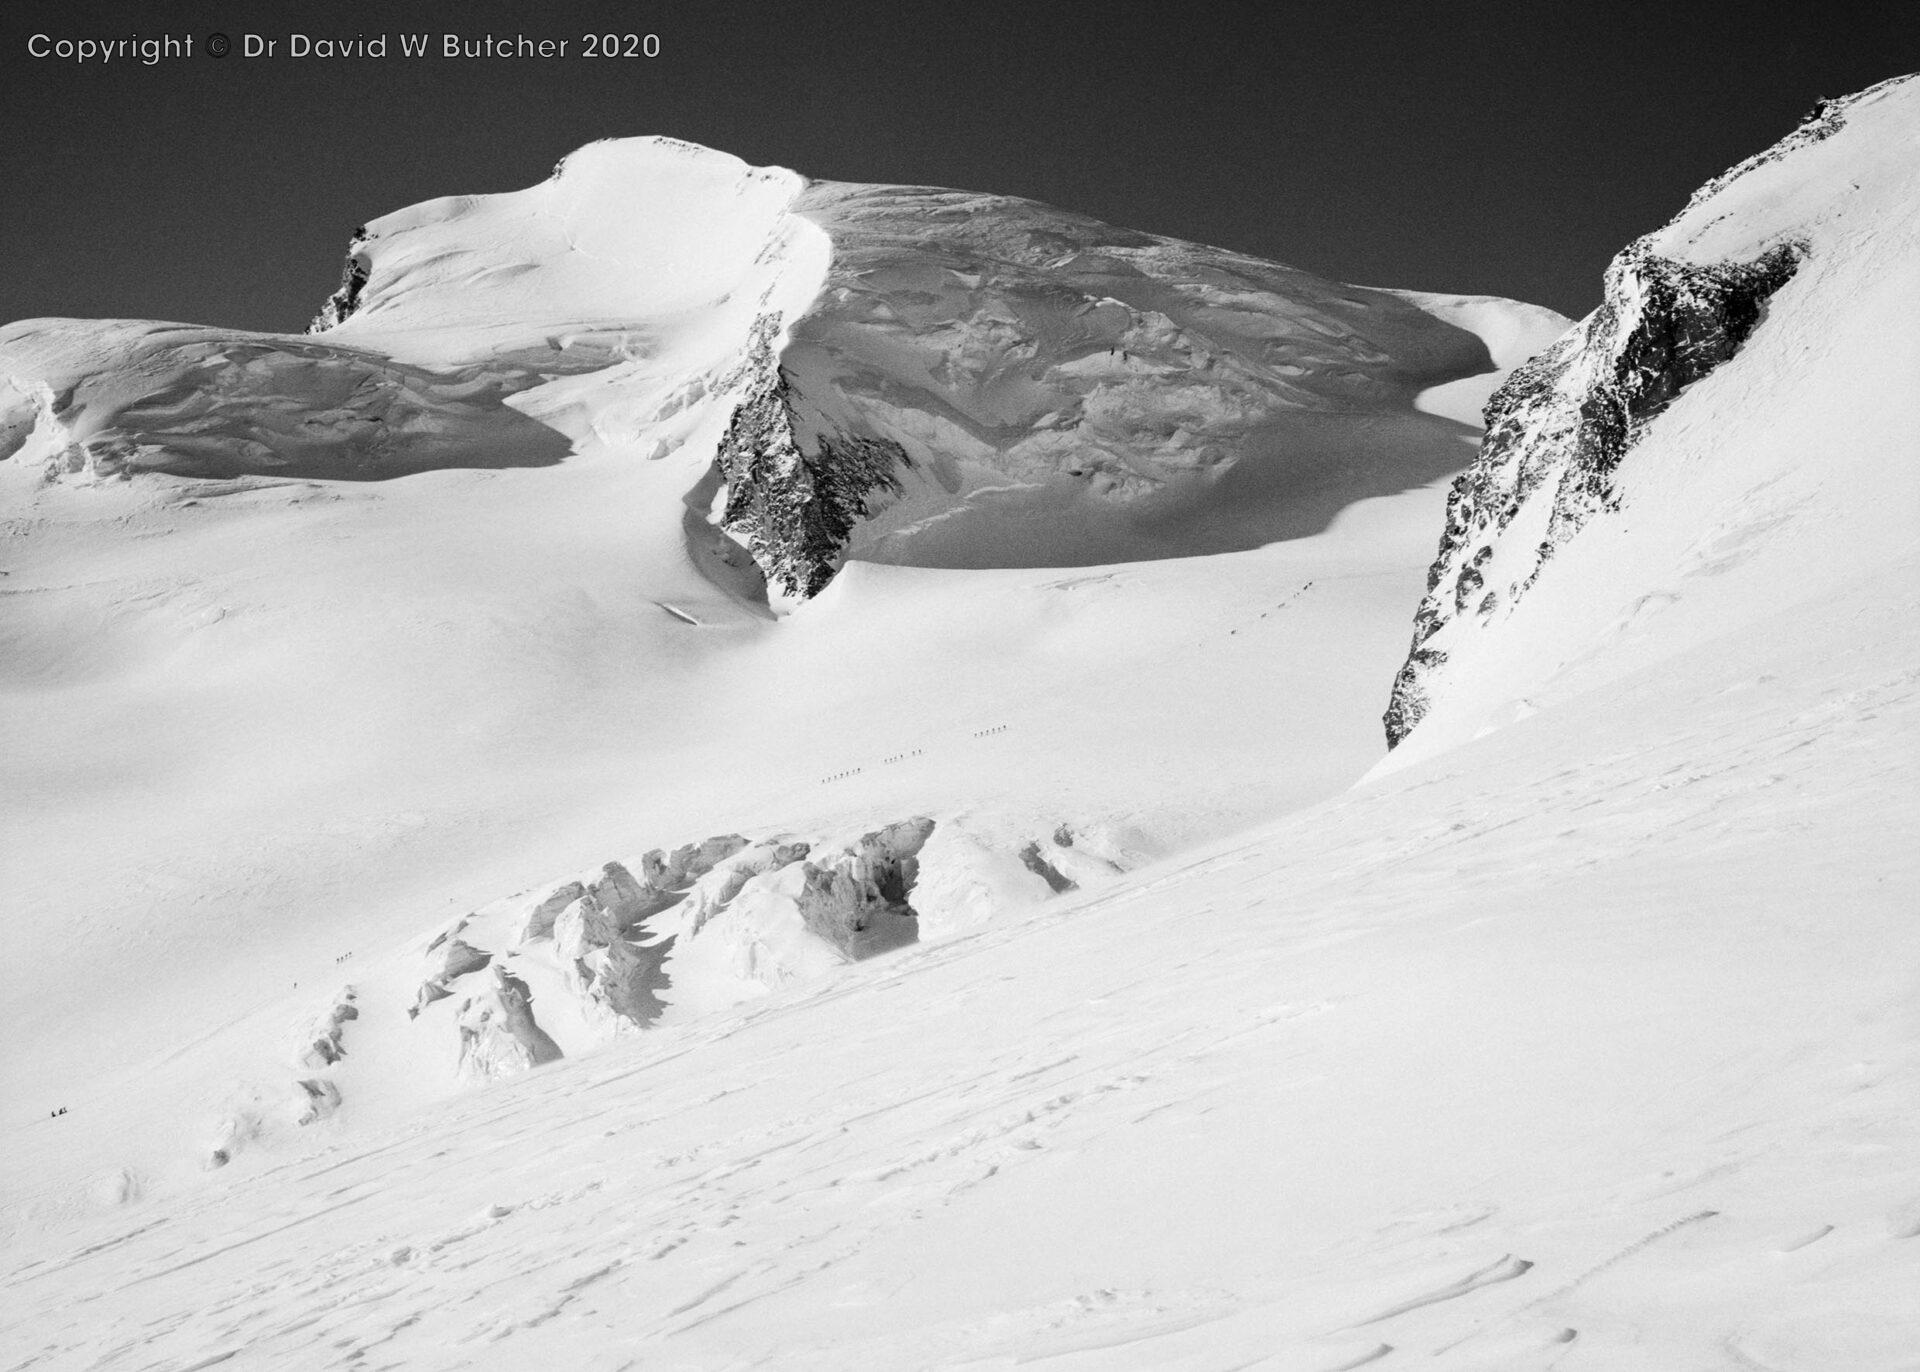 Saas Fee, Strahlhorn from Allalin Pass, Switzerland